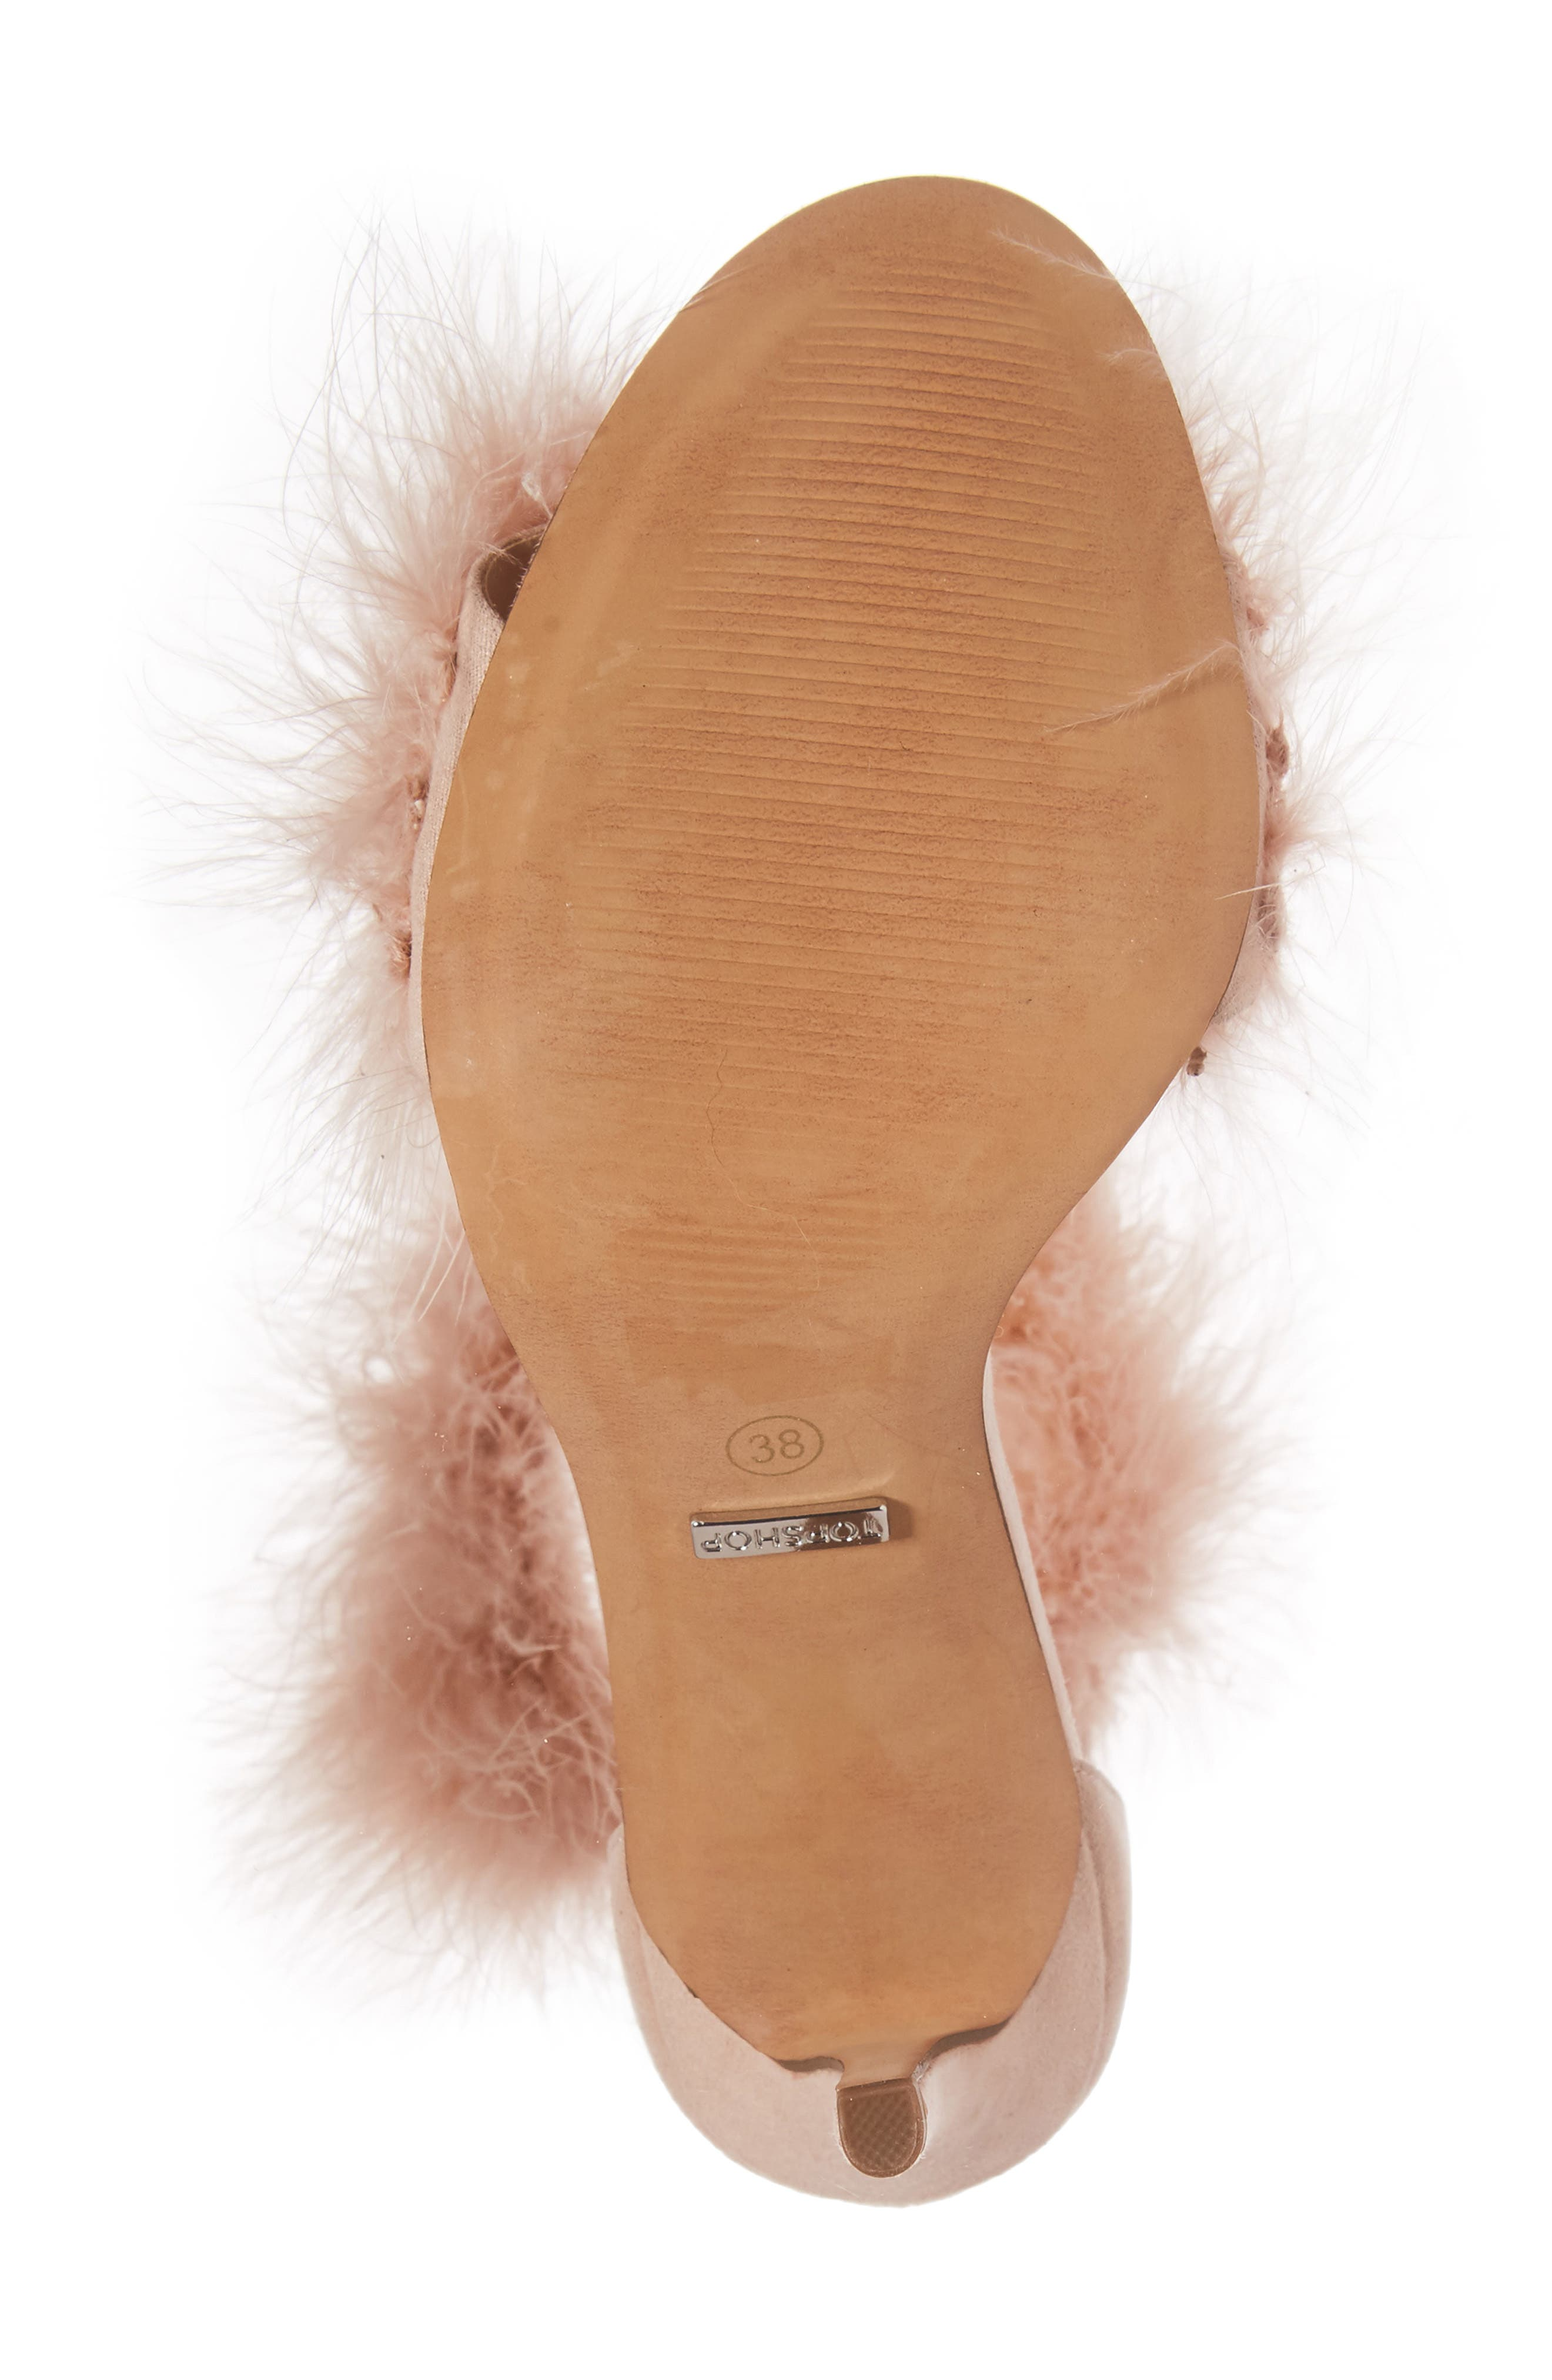 Feather Strap Sandal,                             Alternate thumbnail 6, color,                             250